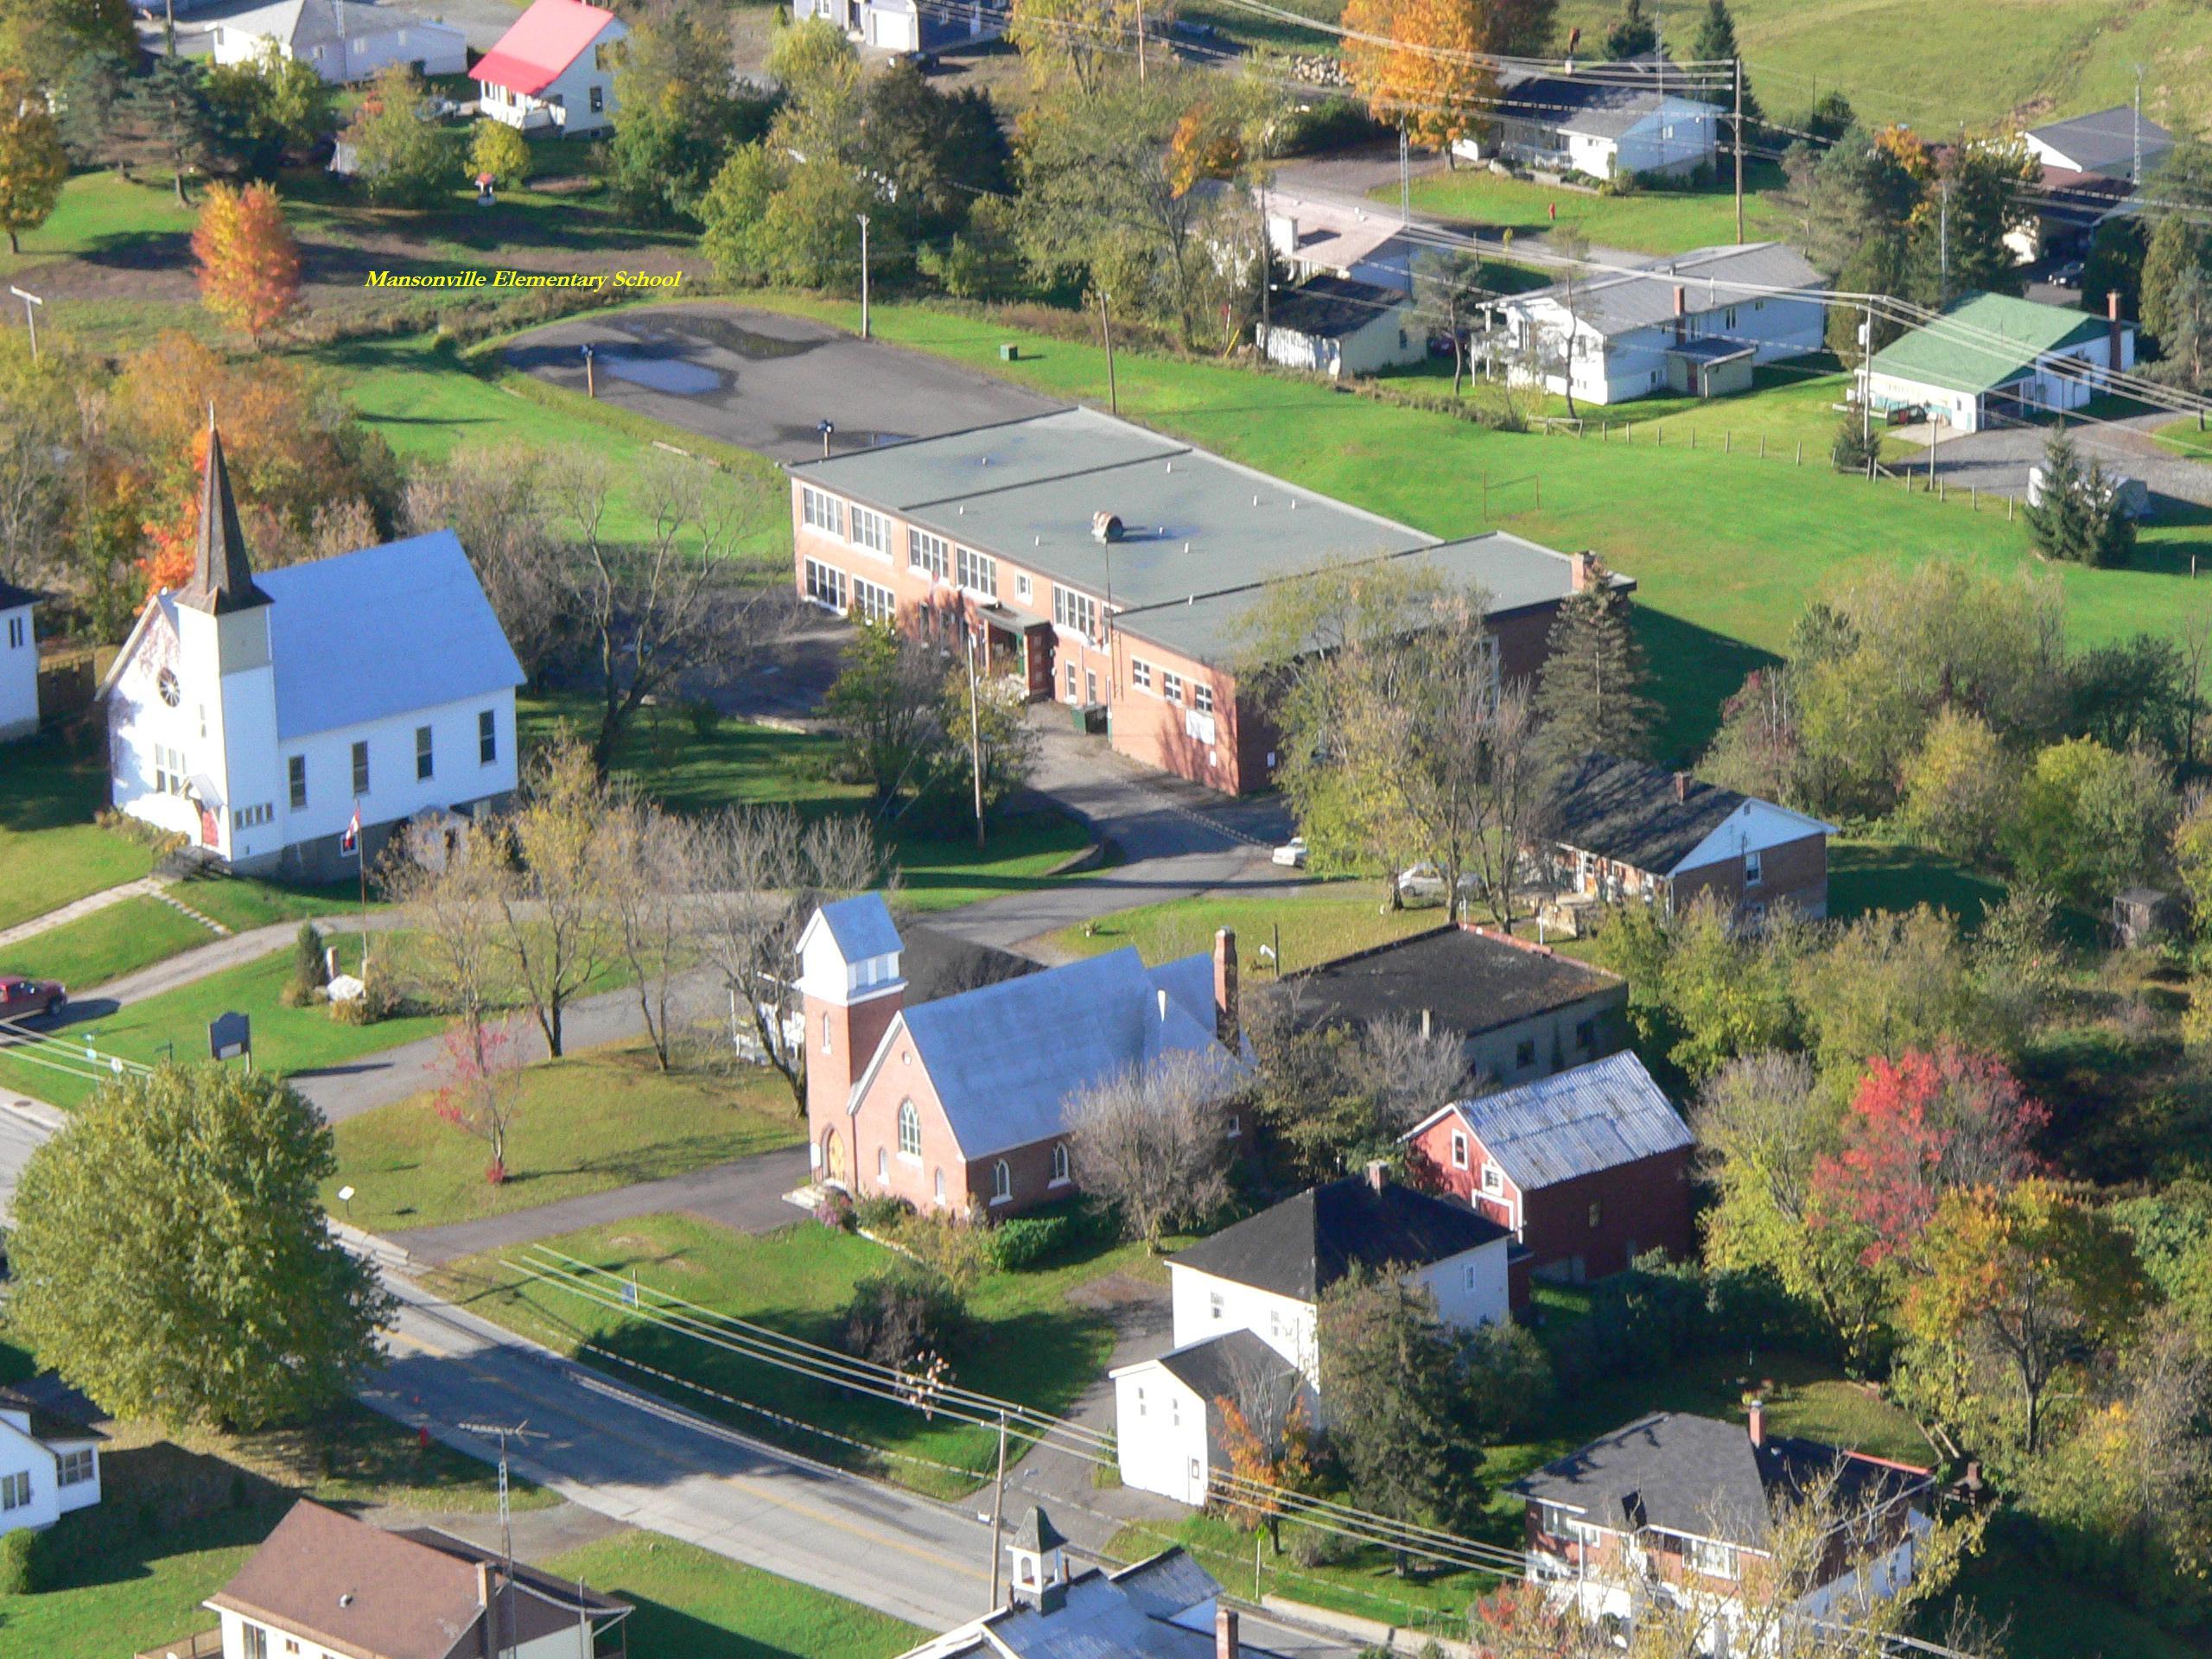 Mansonville